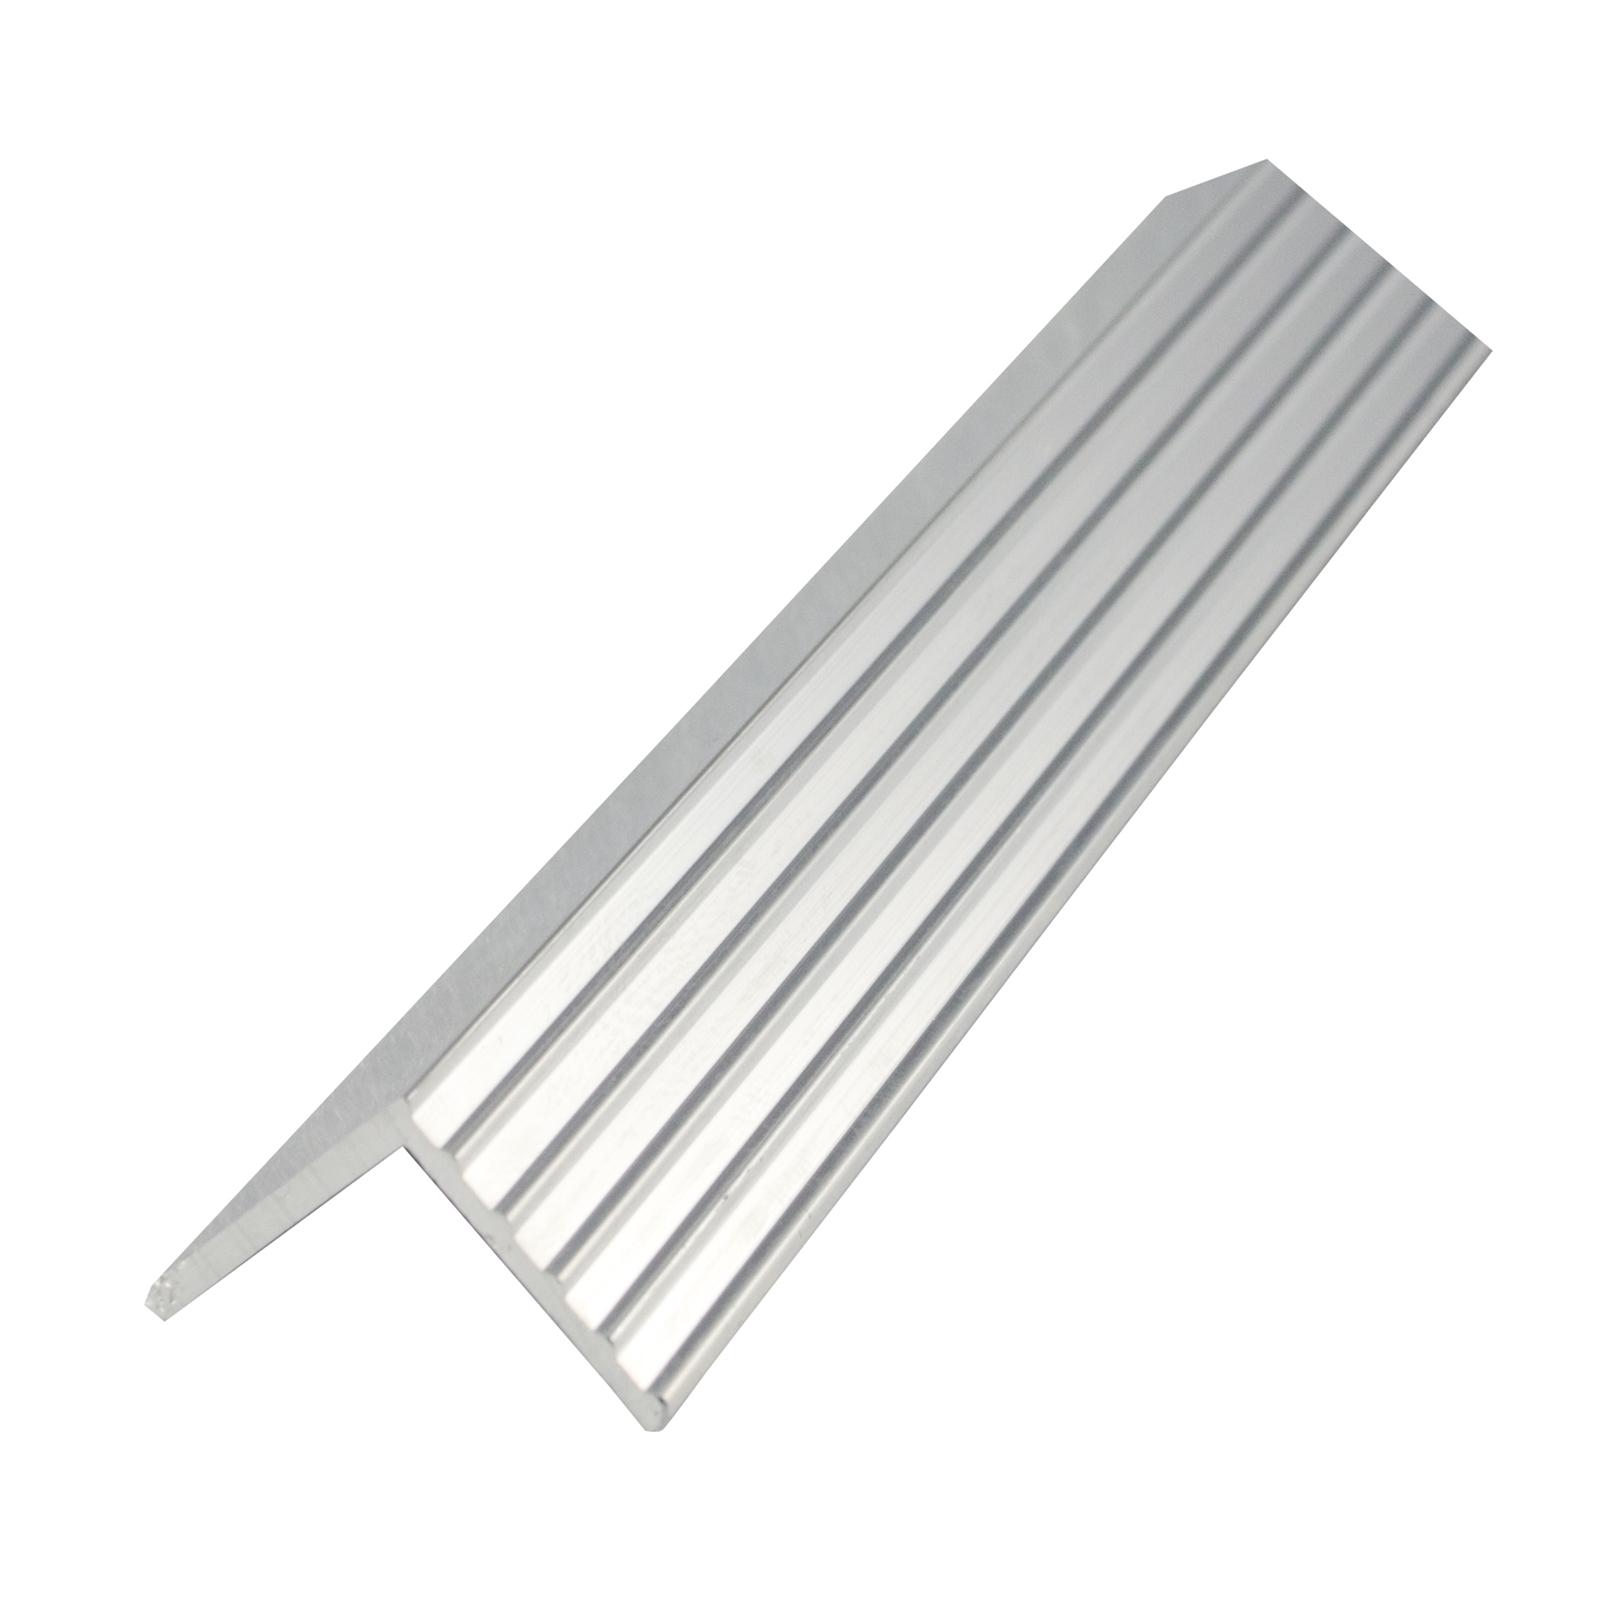 Metal Mate 25.4 x 25.4 x 1.57mm 3m Aluminium Fluted Angle